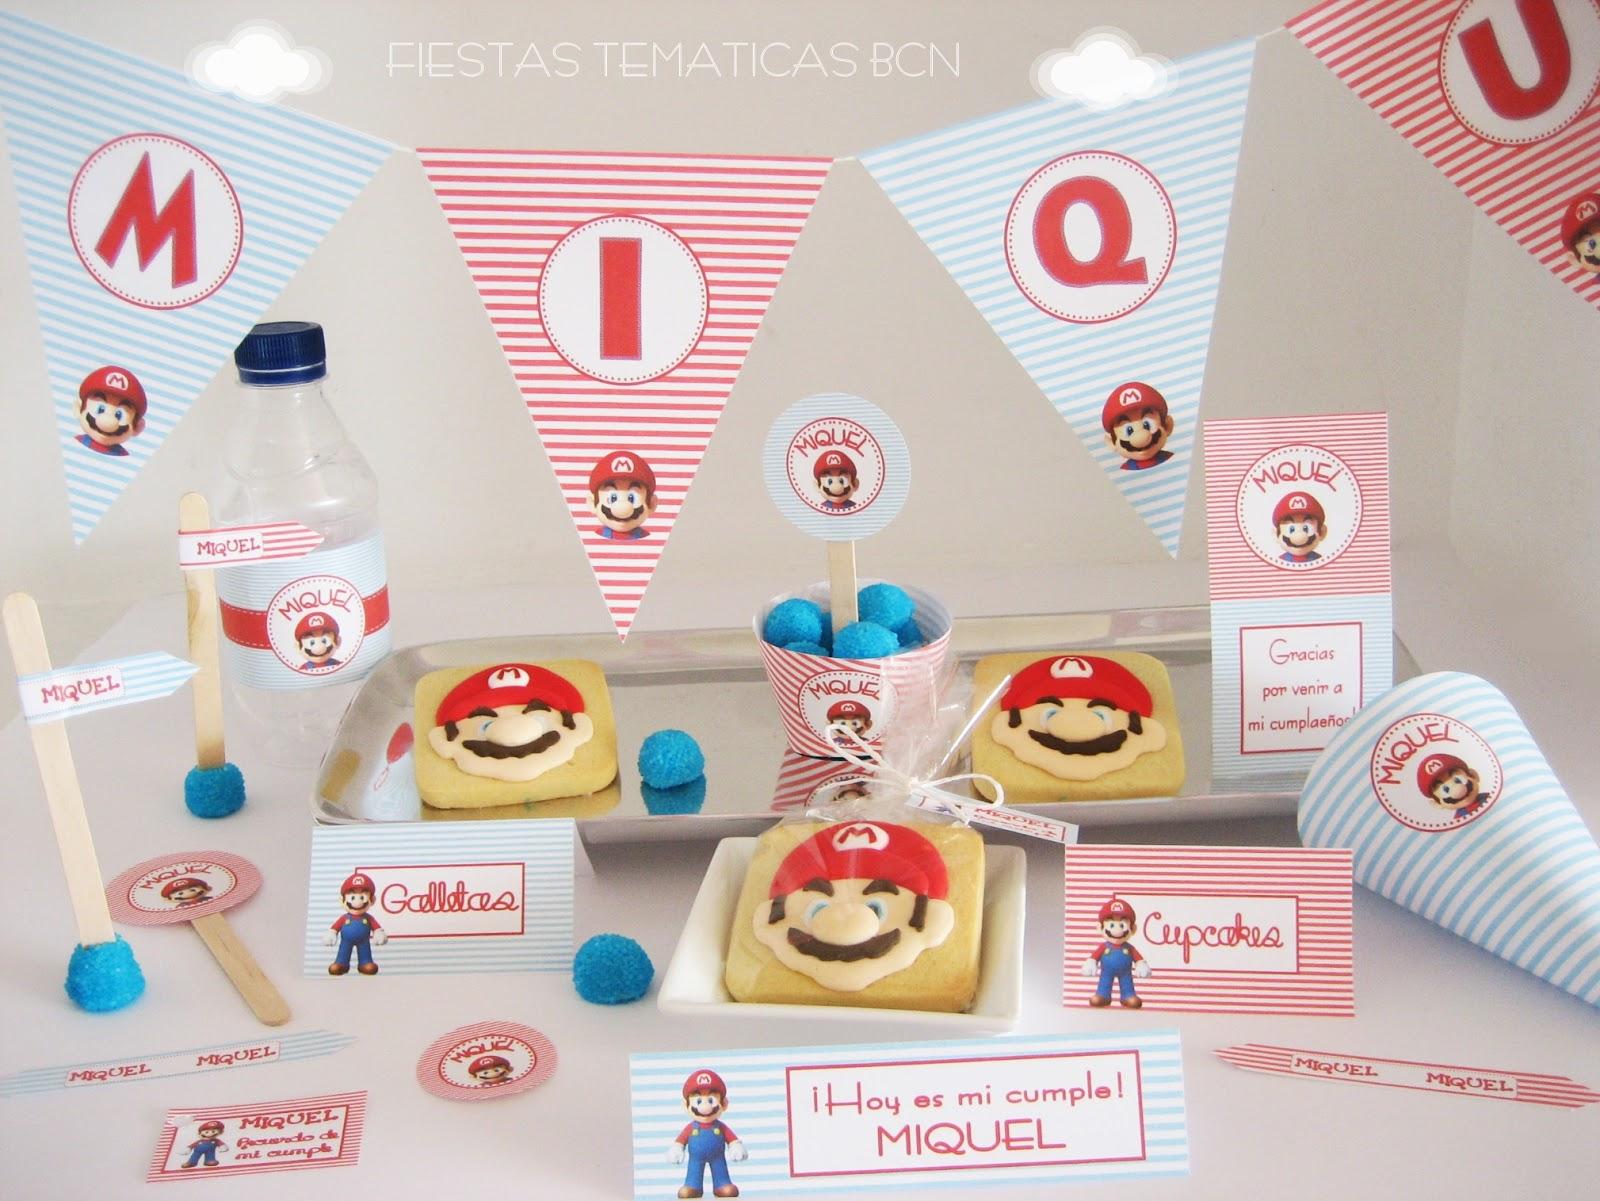 Fiestas tem ticas bcn kits de fiesta imprimibles kit de for Fiestas tematicas bcn